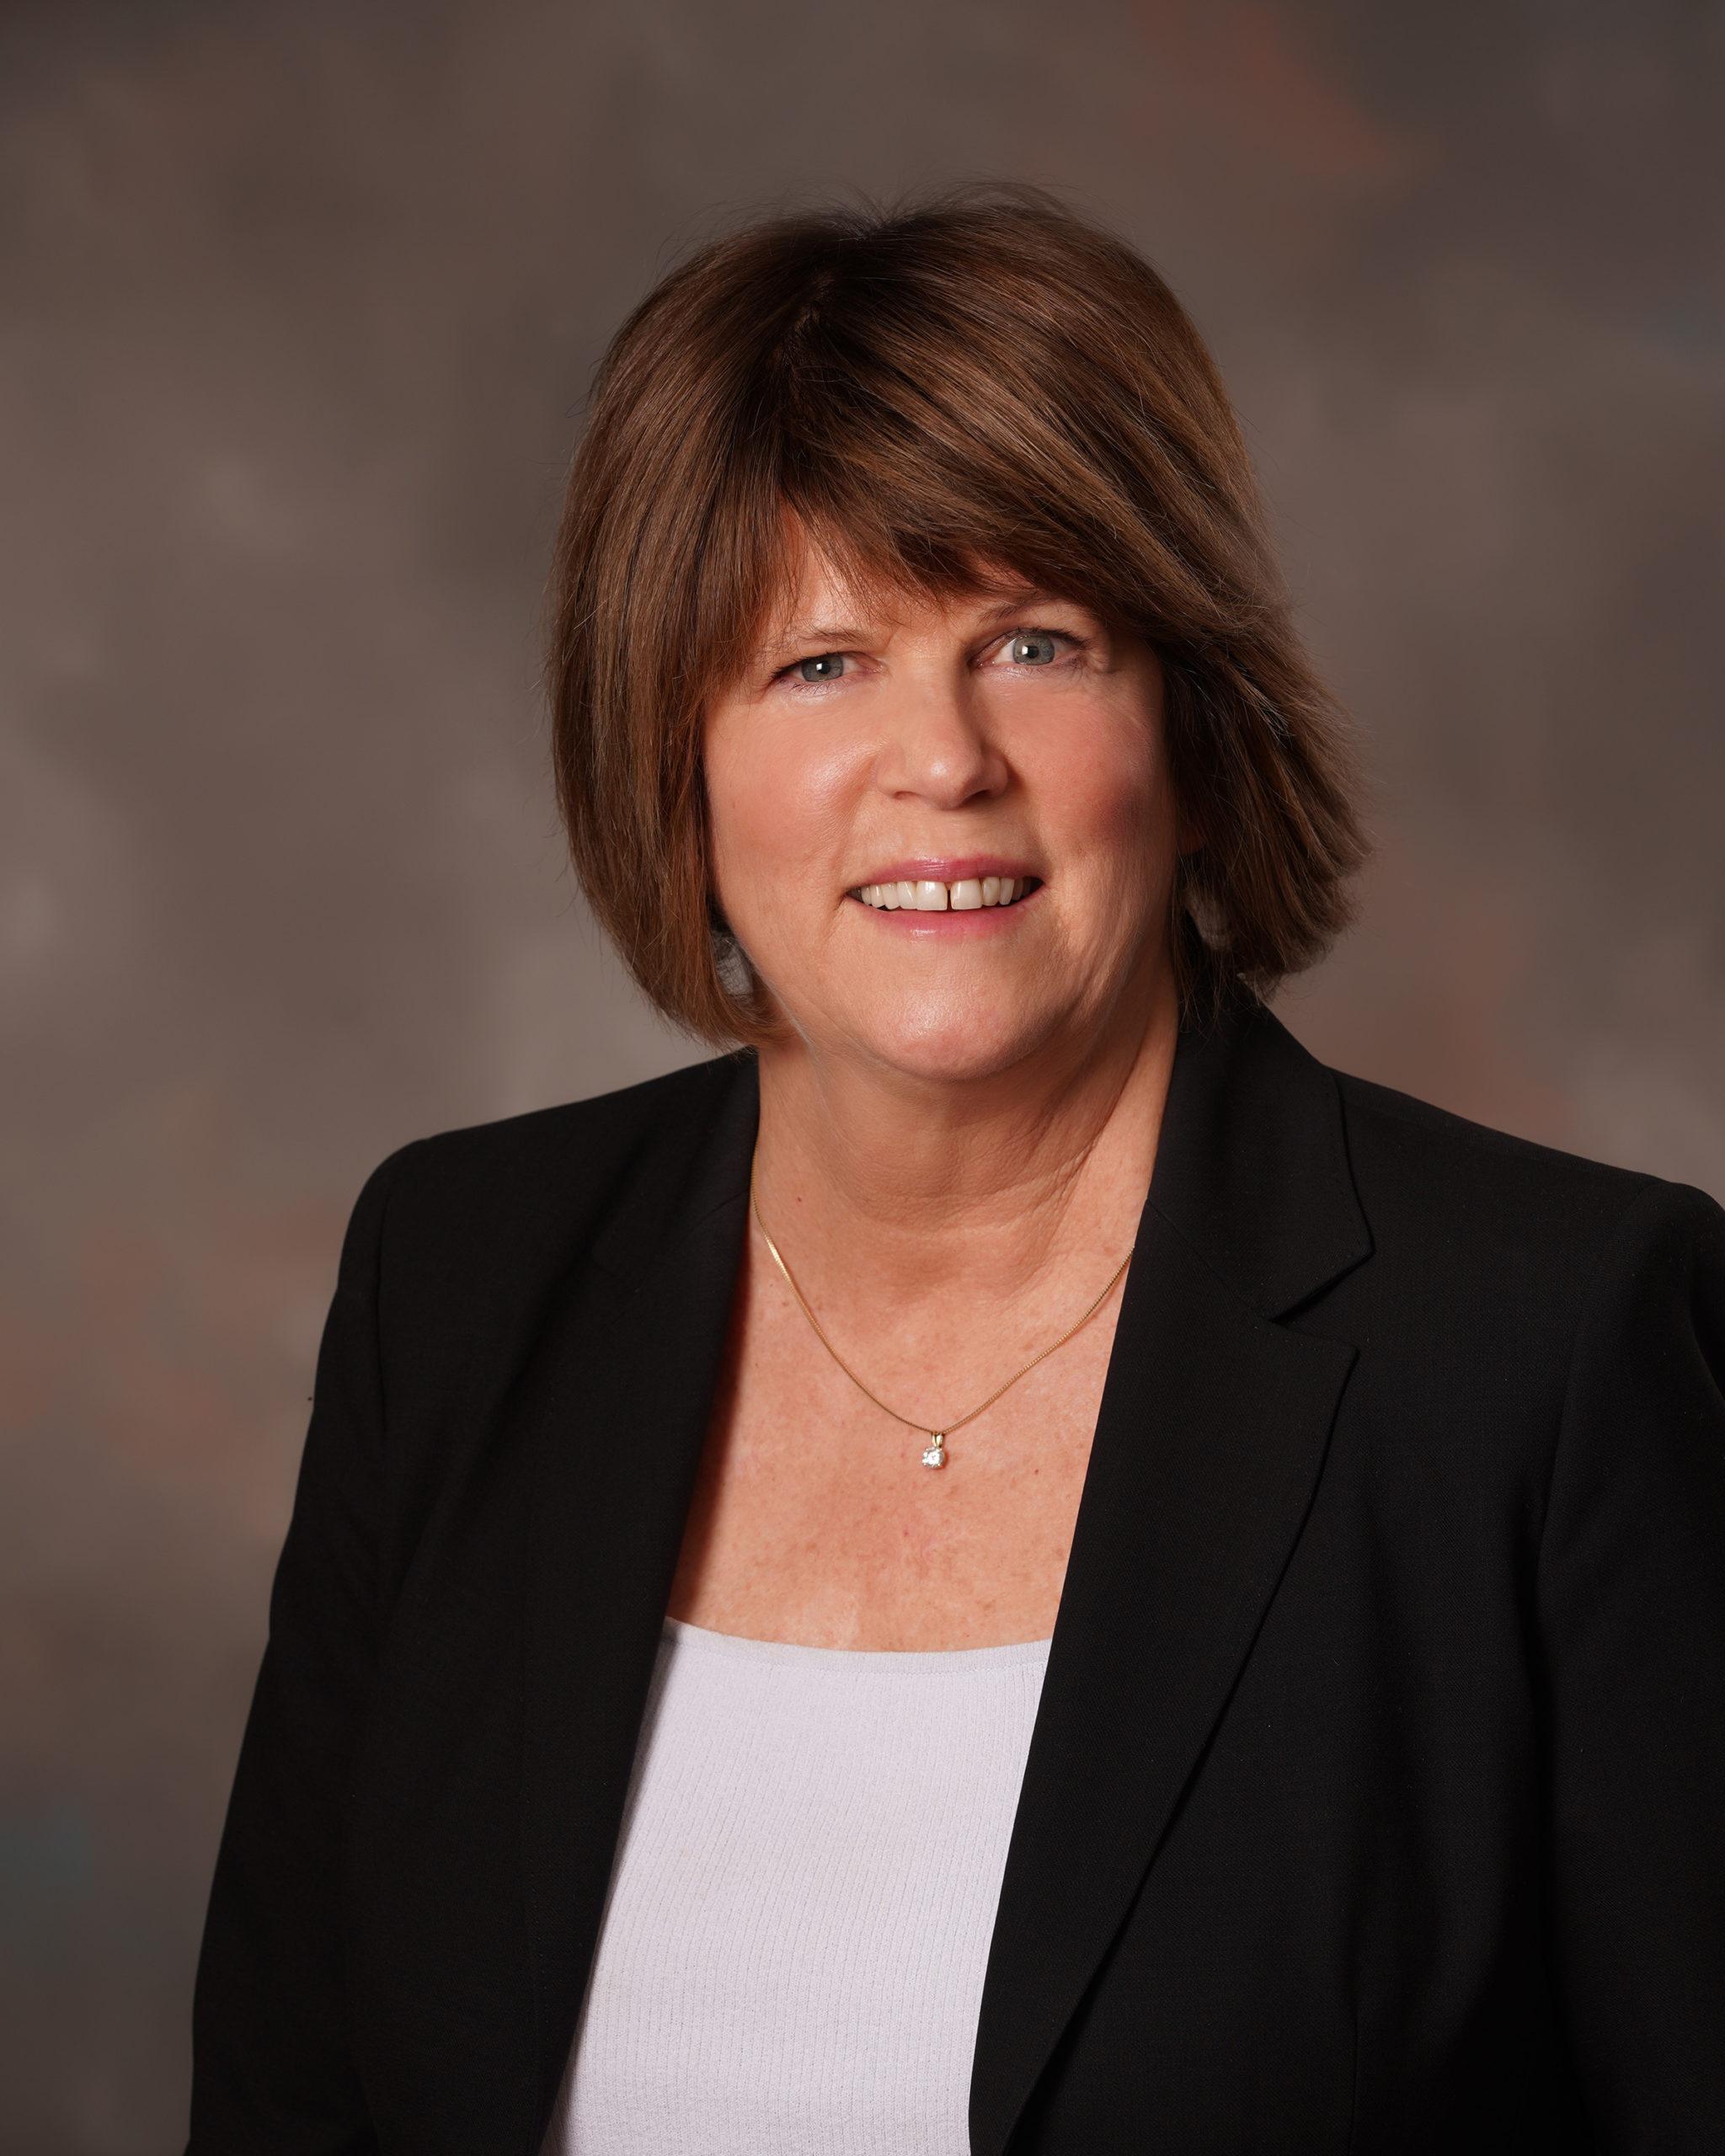 Margaret P. Sack